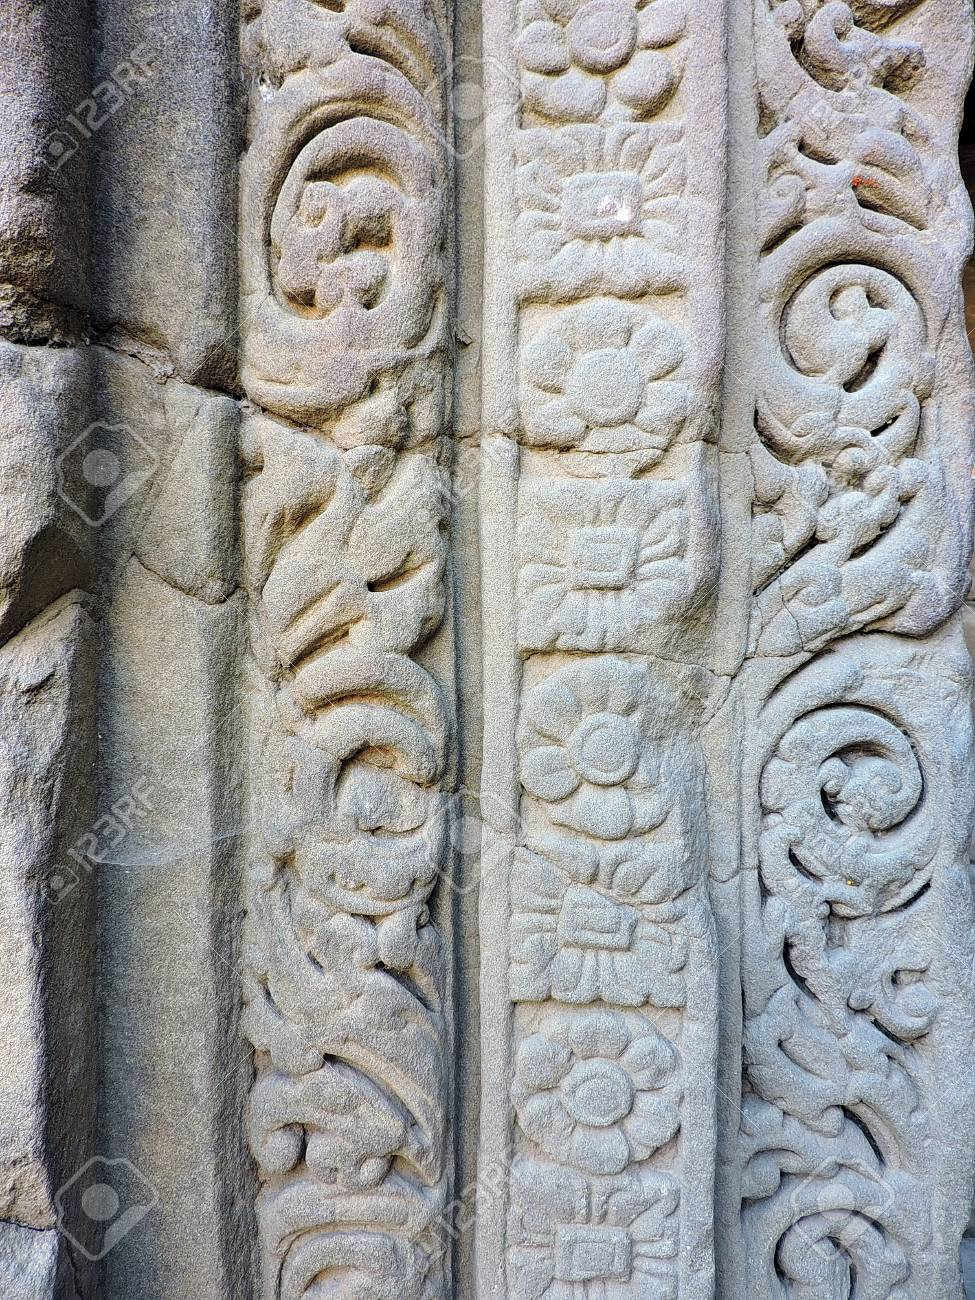 India Architecture Column Masroor Rock Cut Temple Stock Photo - 50491772